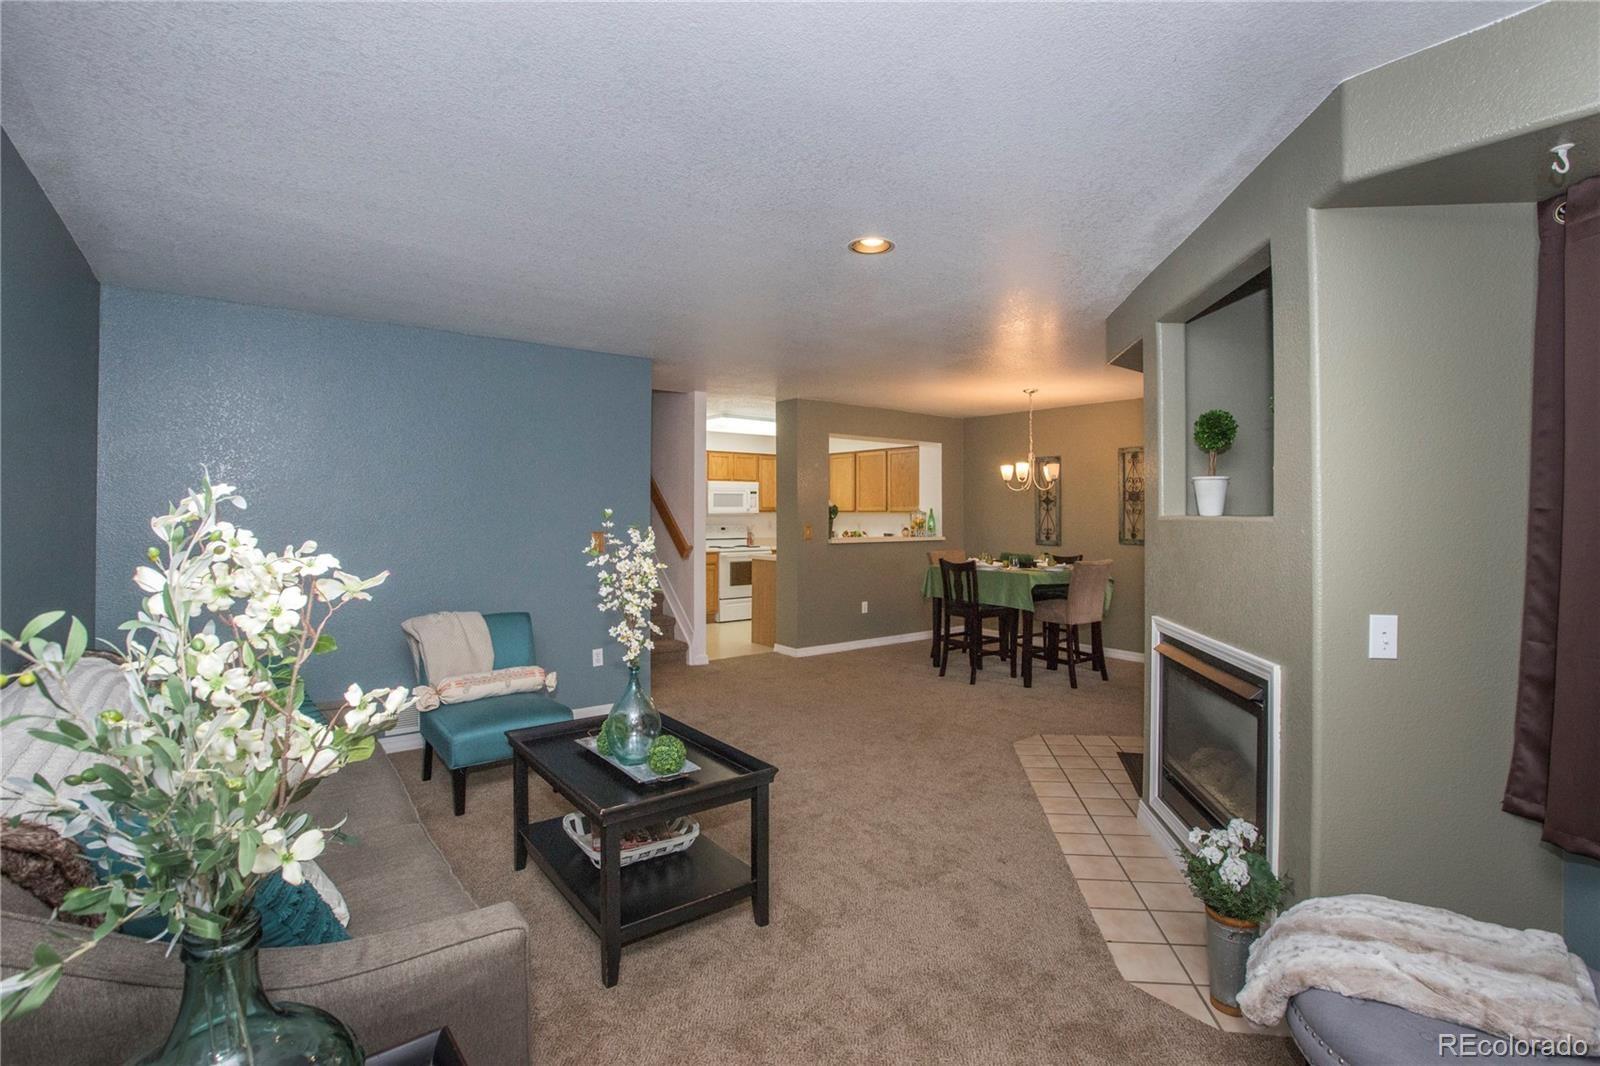 MLS# 3758449 - 9 - 6802 Antigua Drive #26, Fort Collins, CO 80525